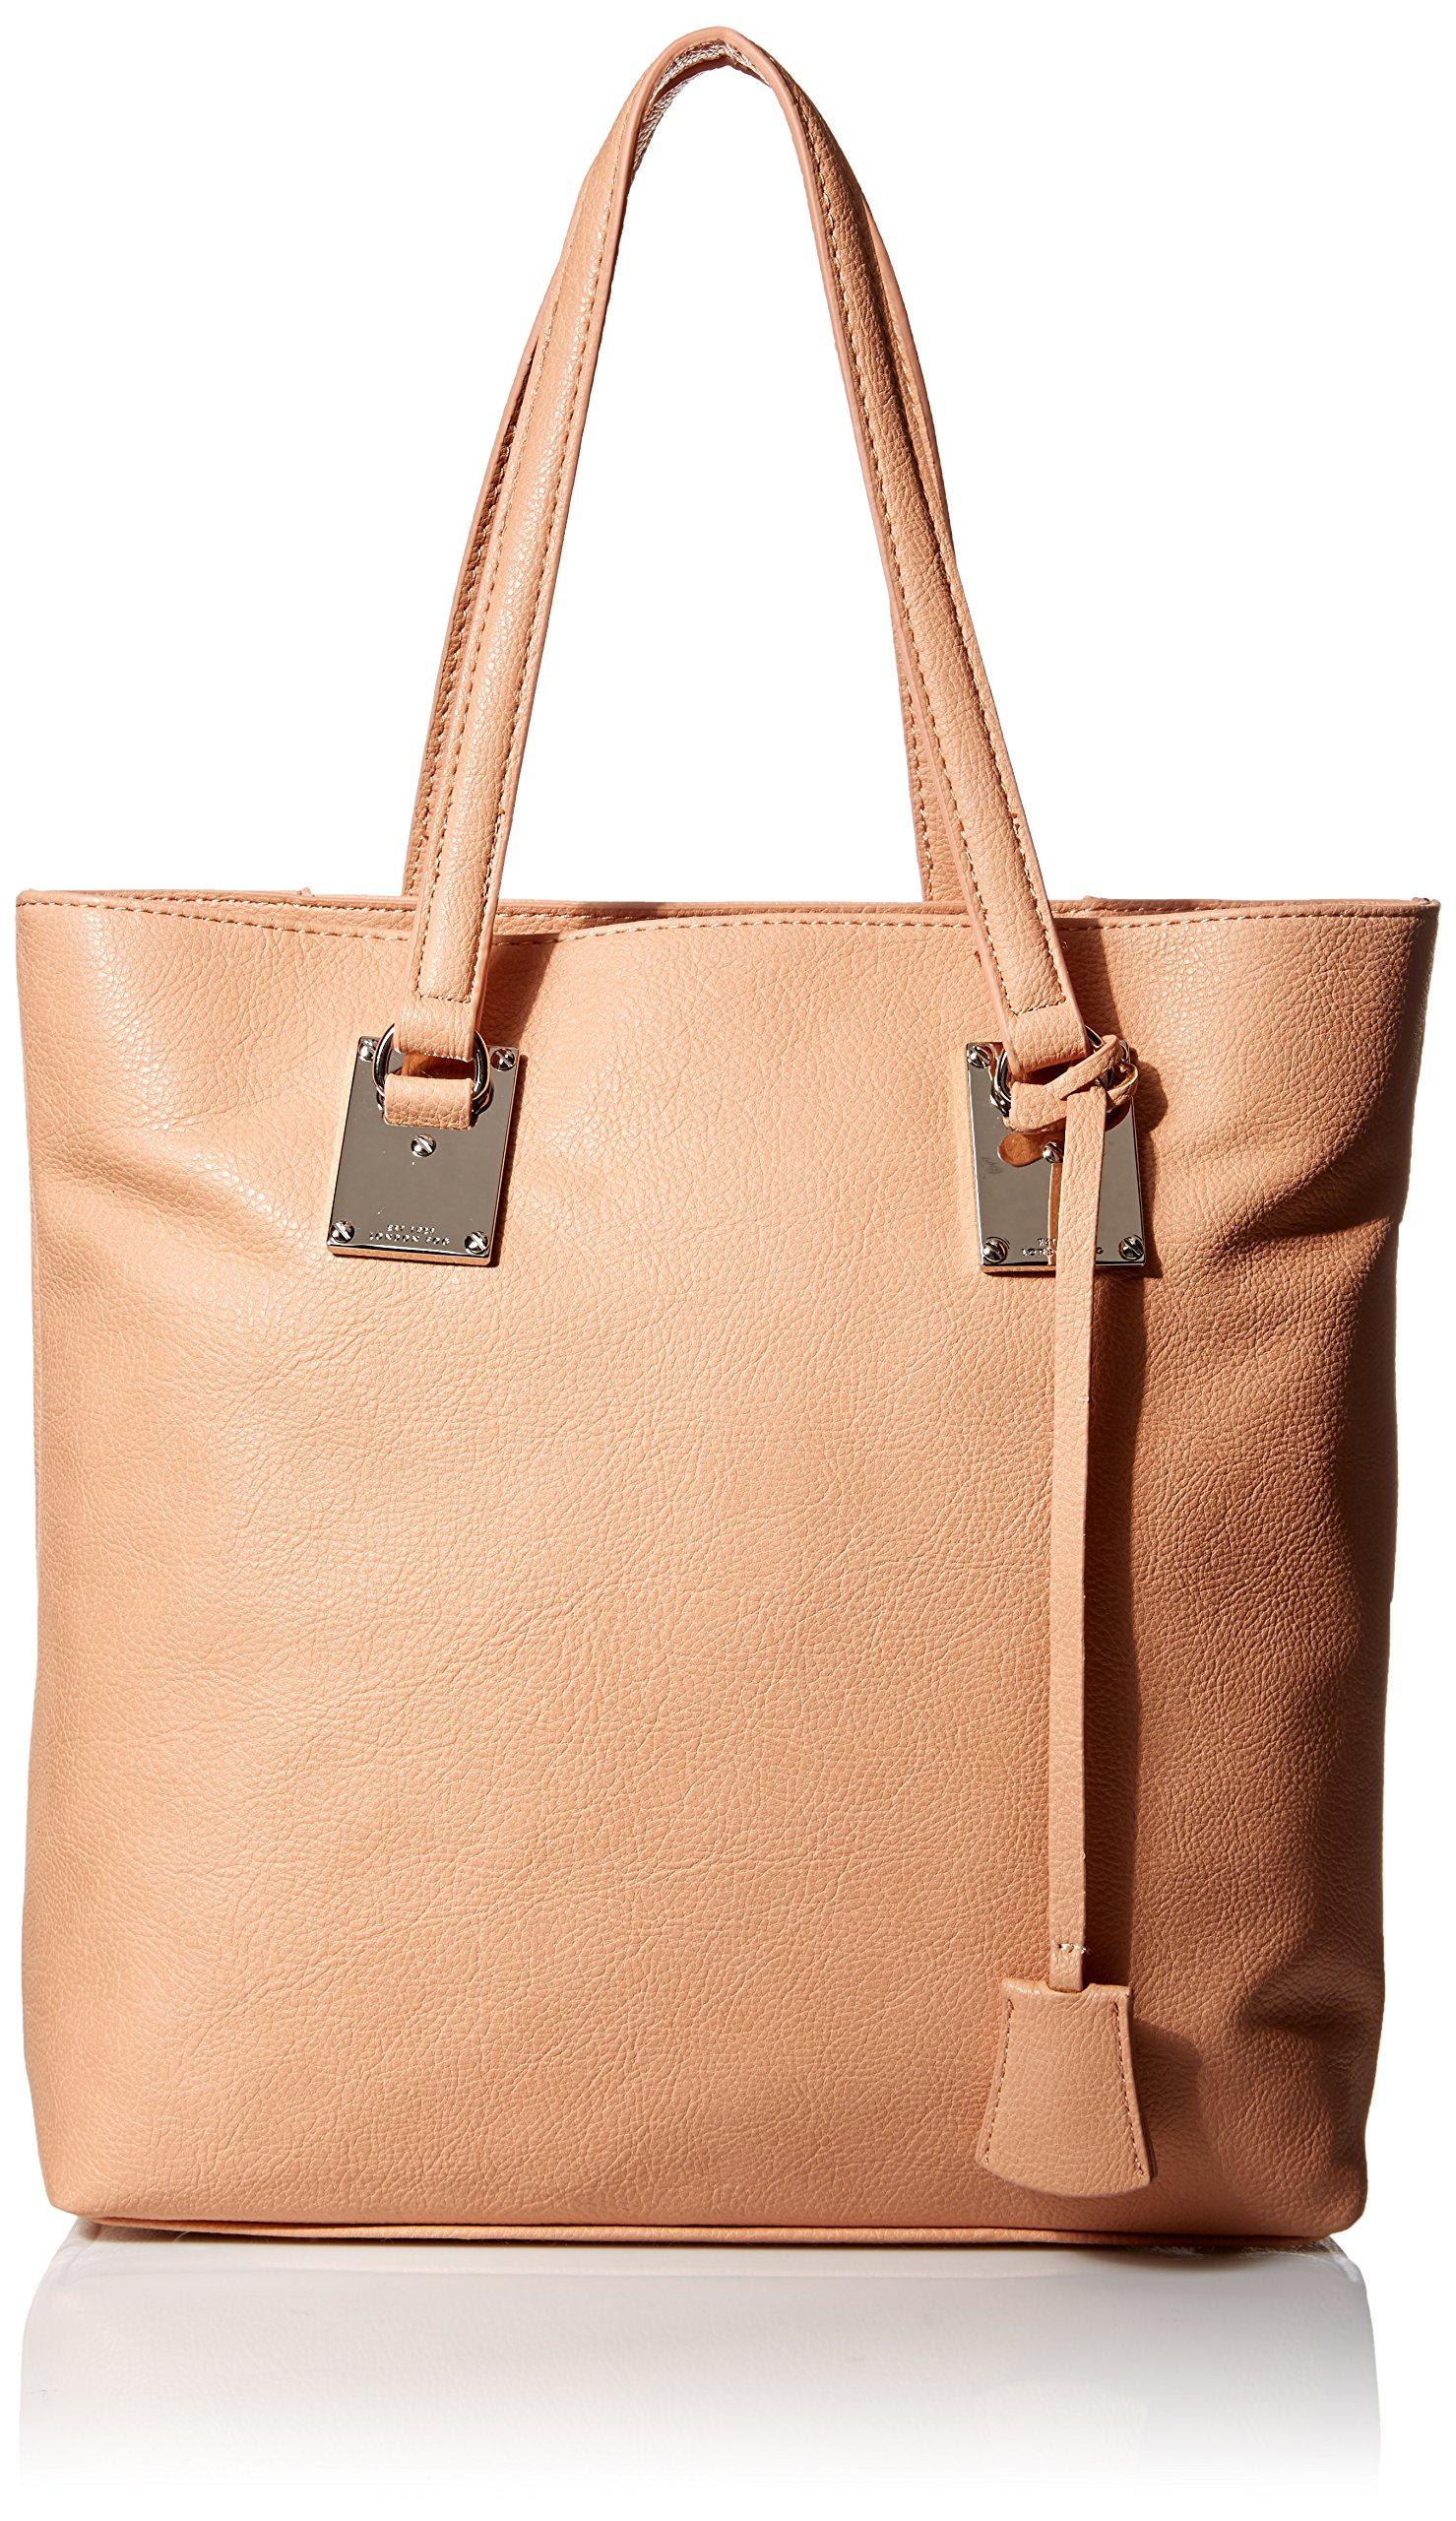 London Fog Smithfield Style Tote Bag ,Peach ,One Size by London Fog